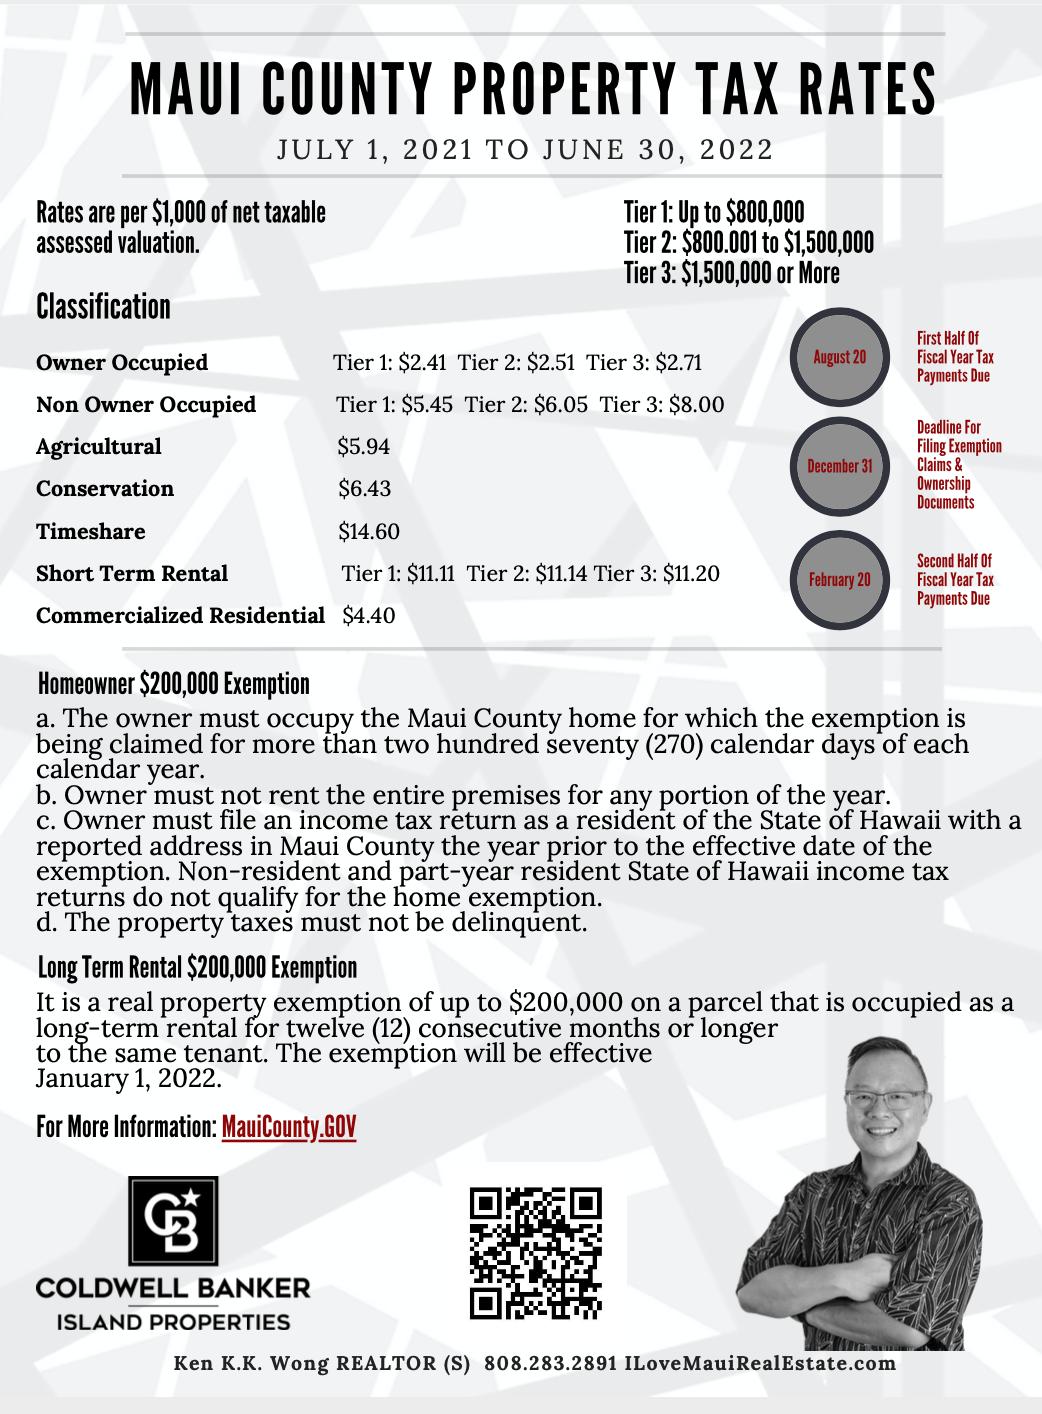 Maui County Property Tax Main Photo